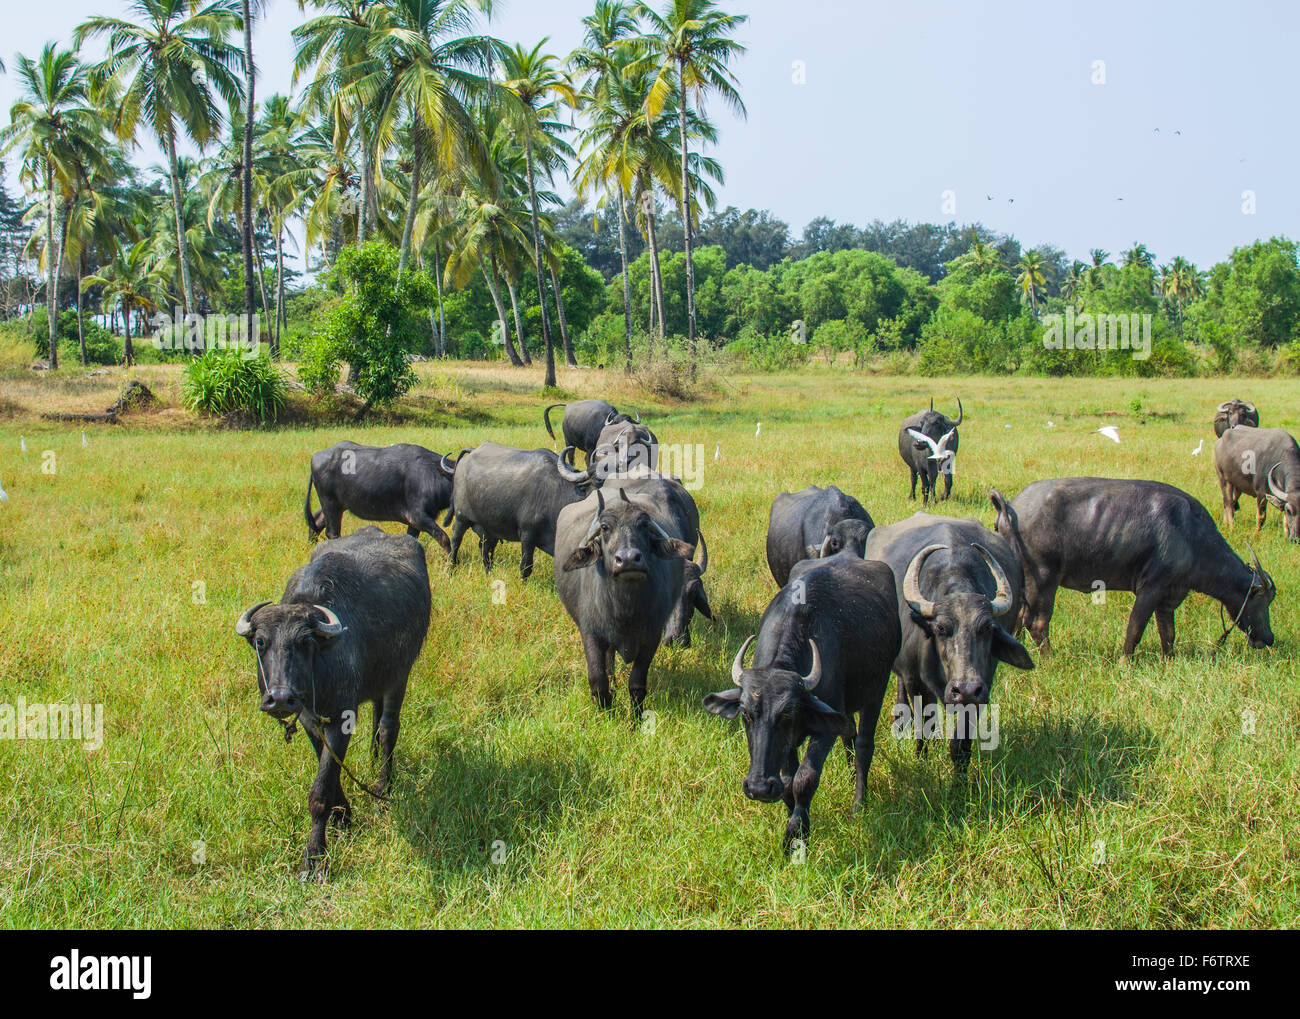 Bull pasture of animals animal husbandry - Stock Image